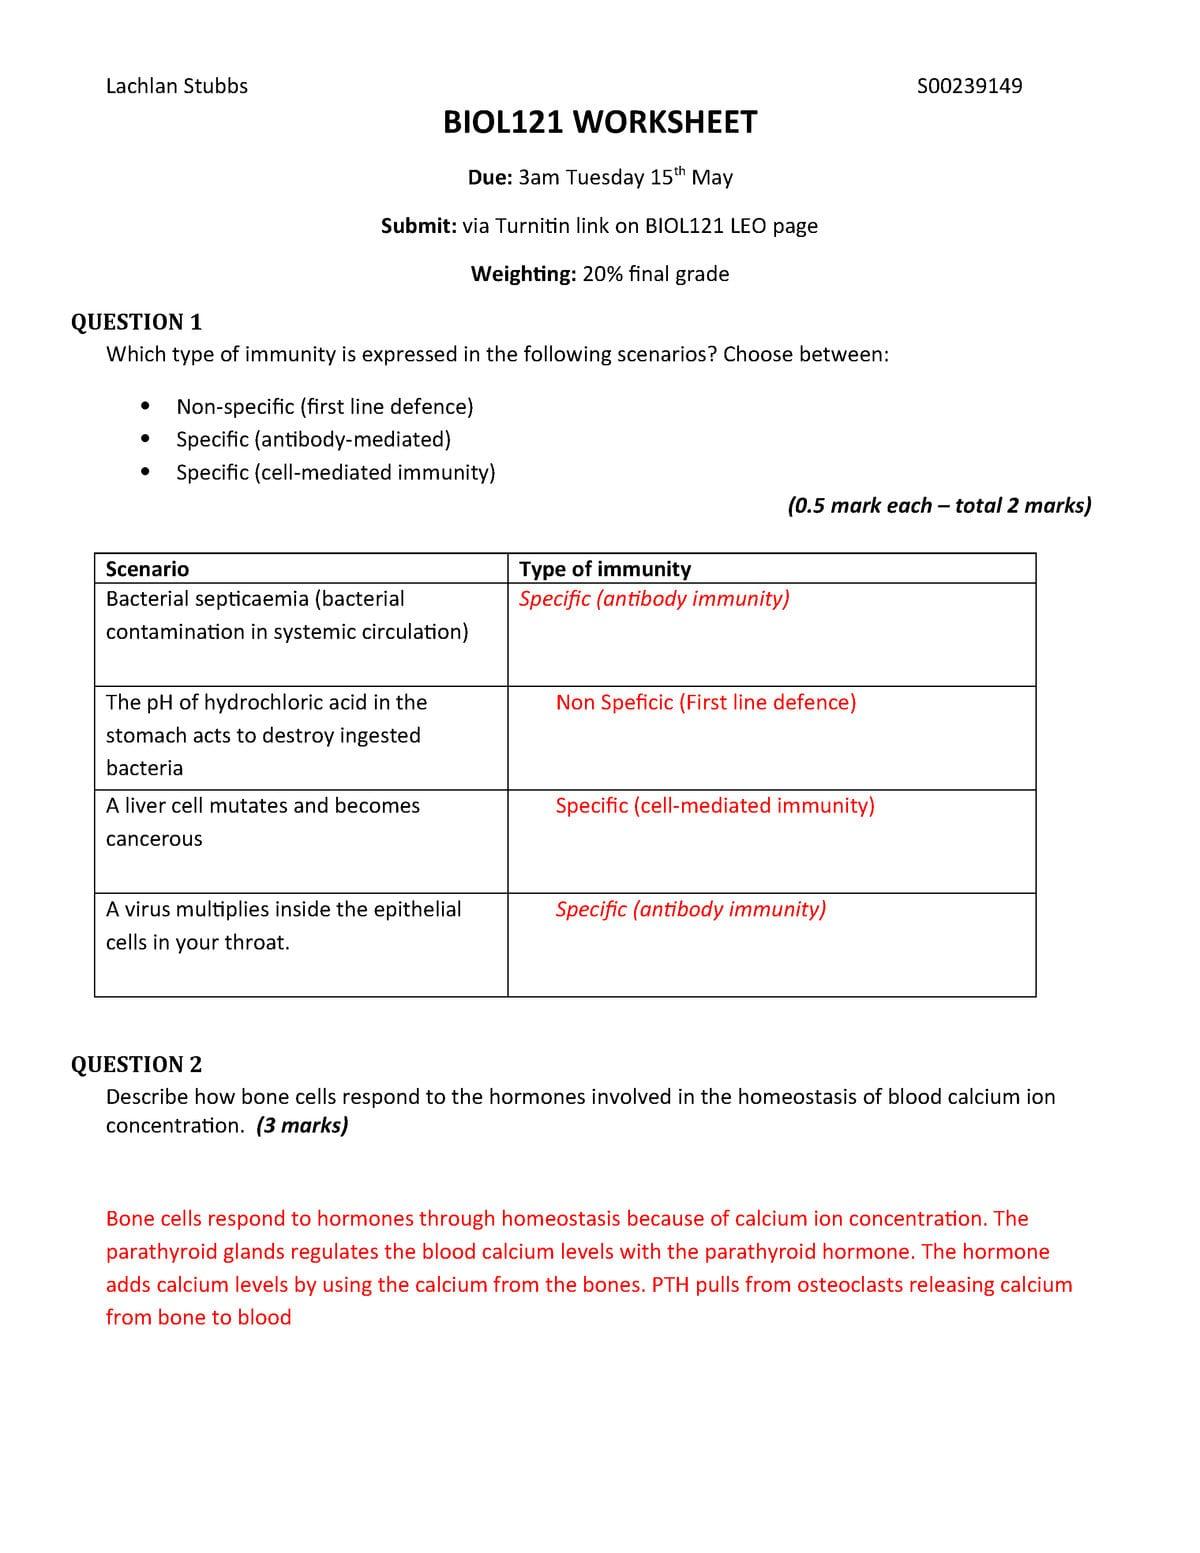 Exam Questions And Answers Biol121 Acu Studocu